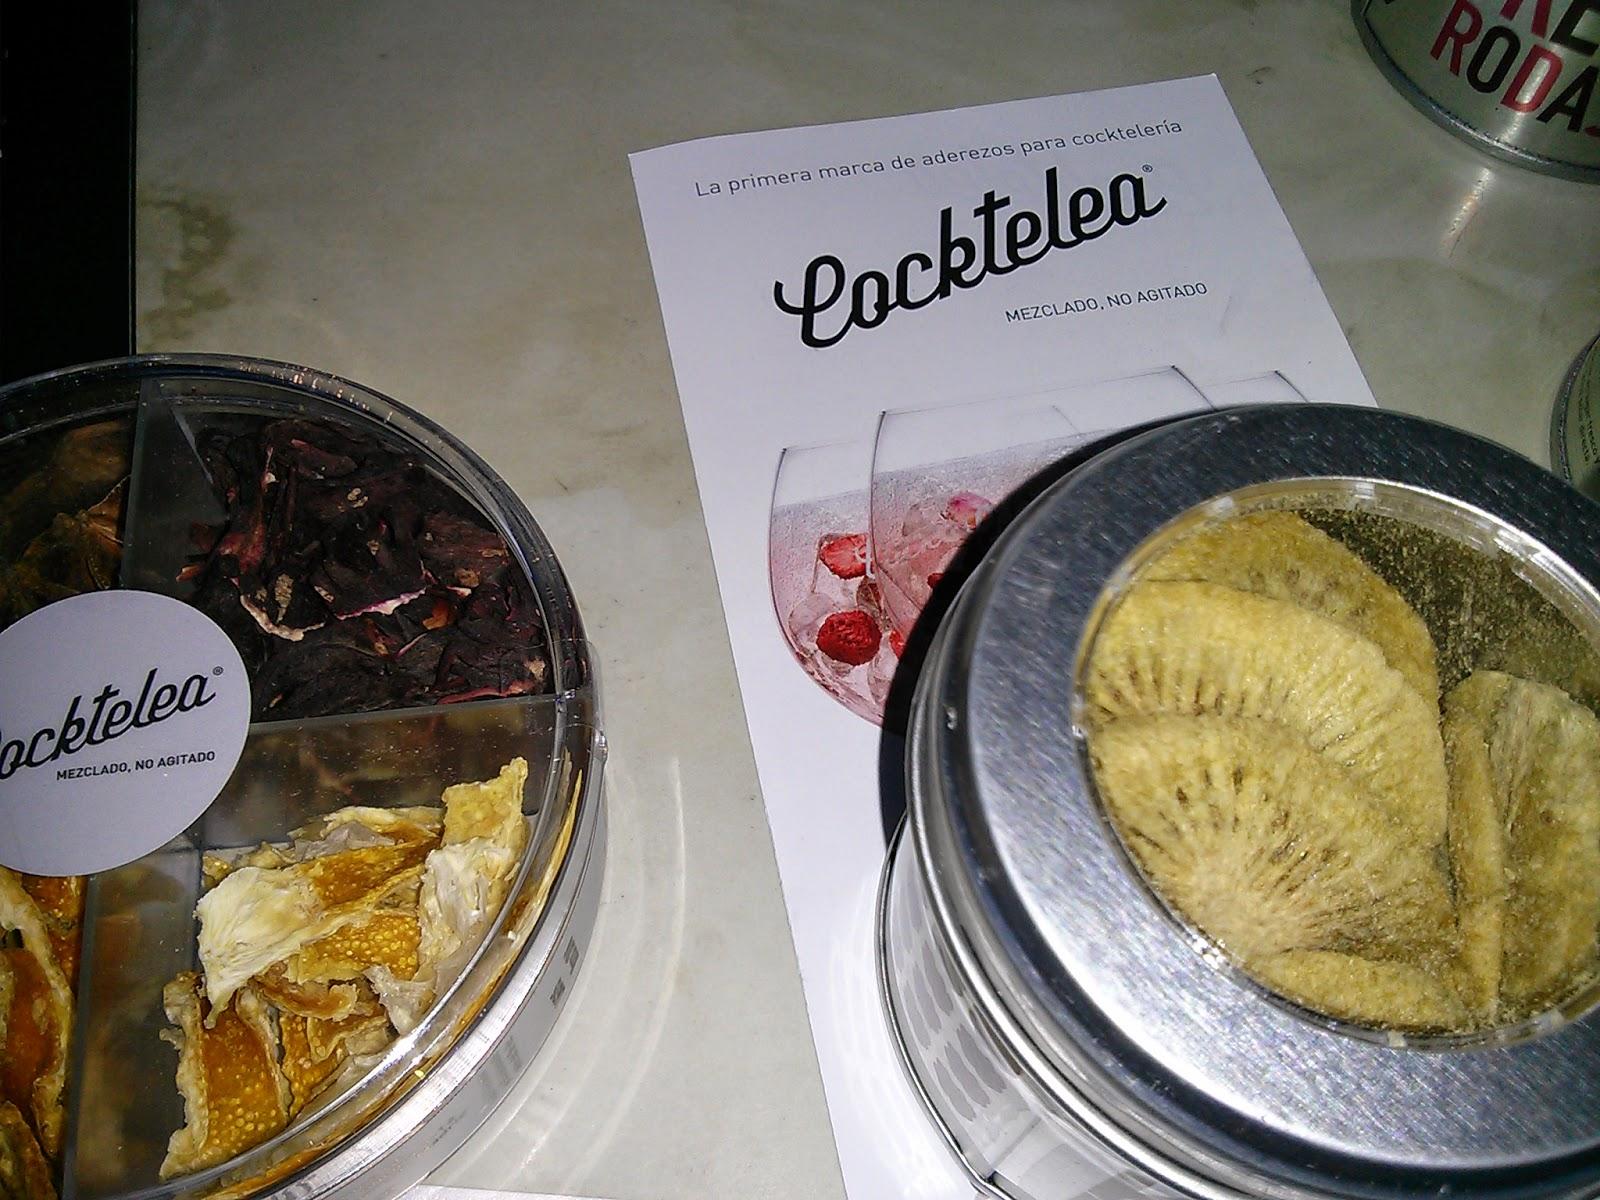 Cocktelea